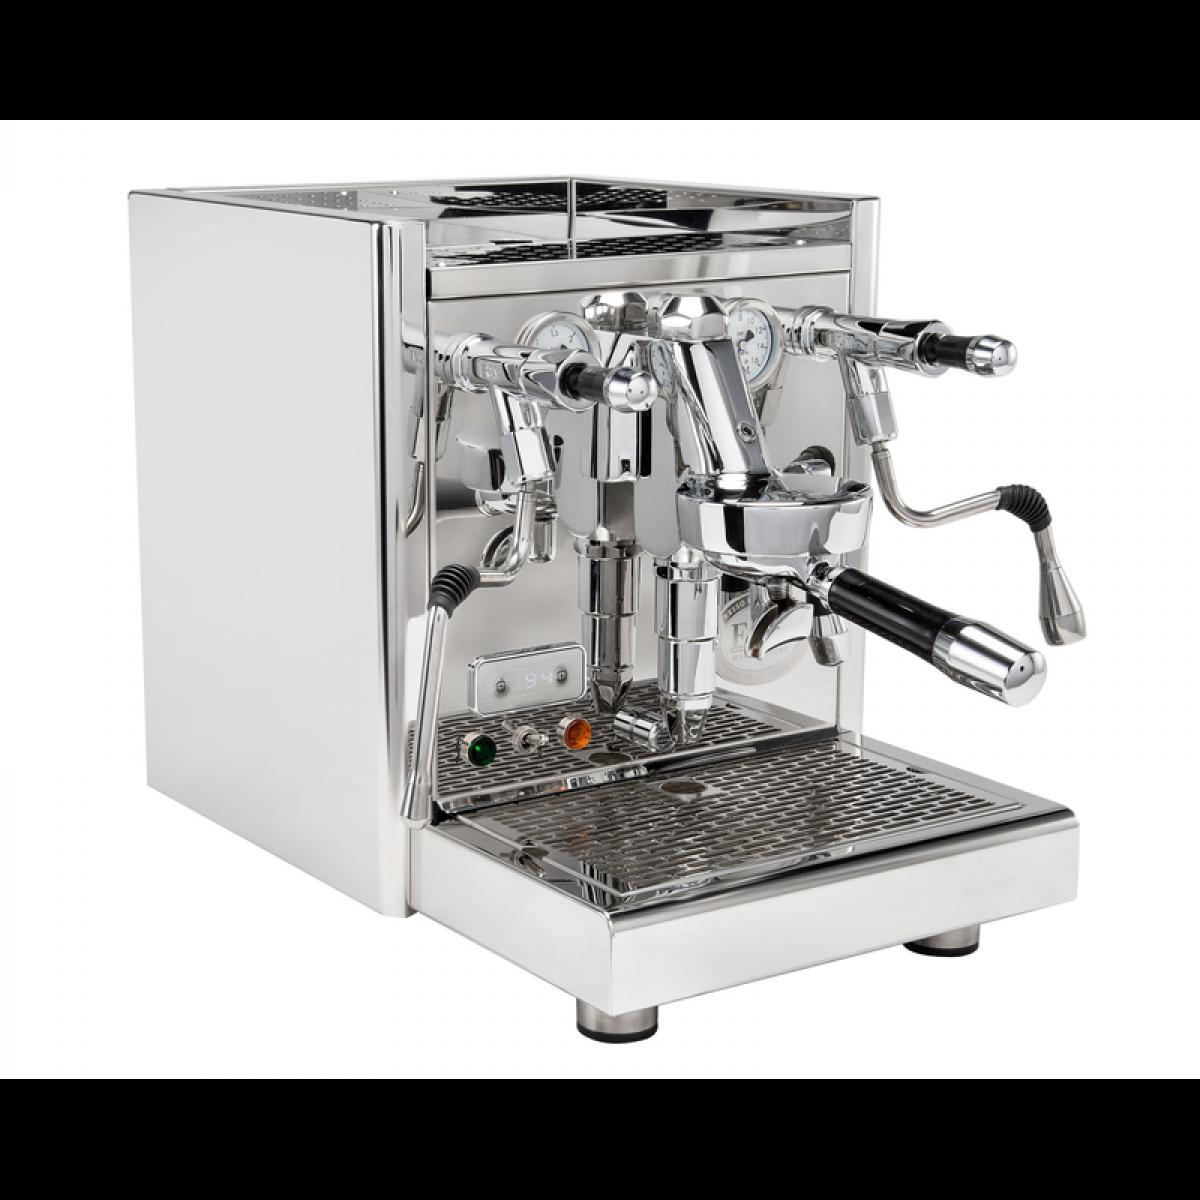 ECM Espressomaschine Technika V Profi PID